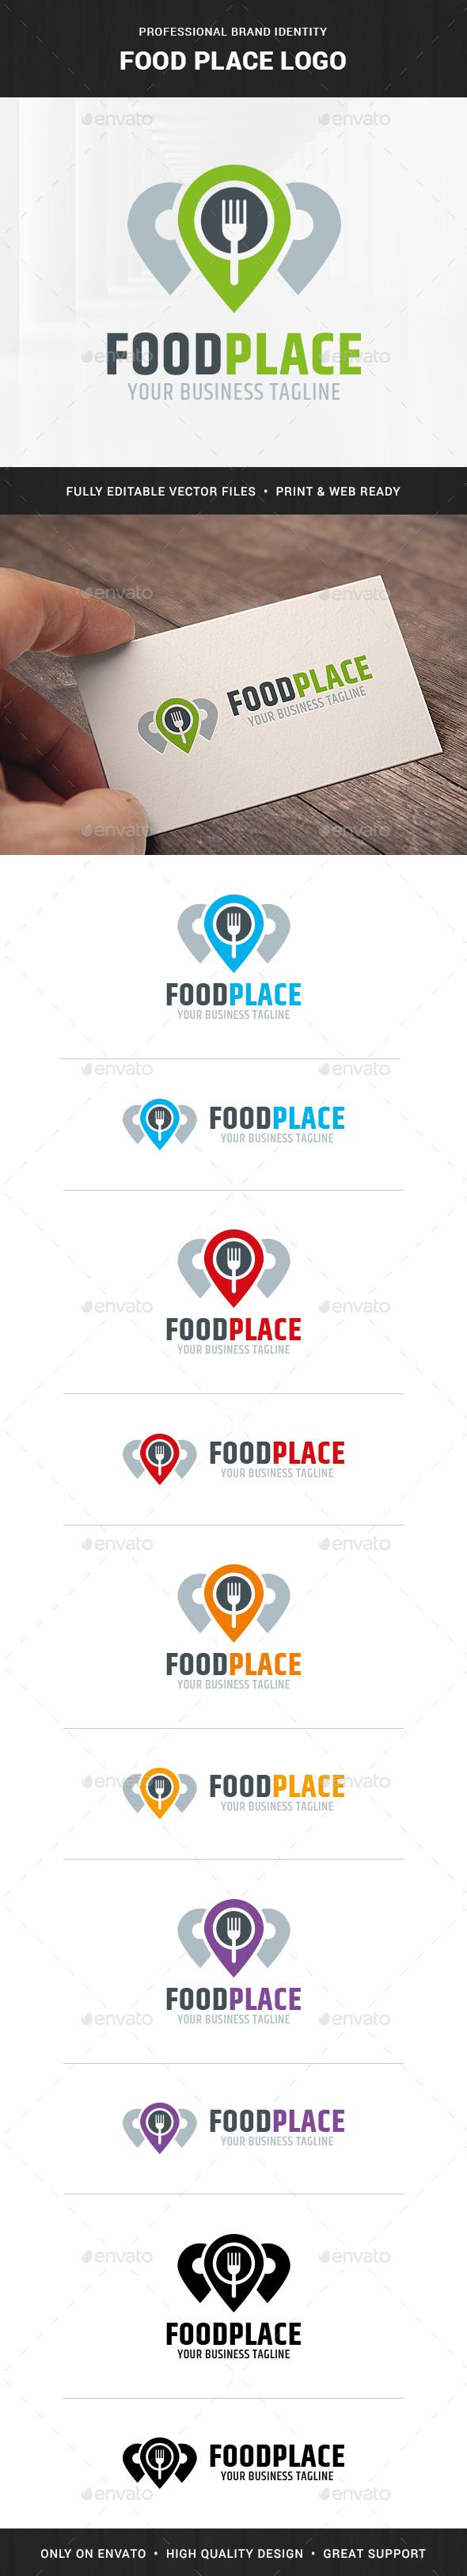 Food Place Logo Template - Food Logo Templates